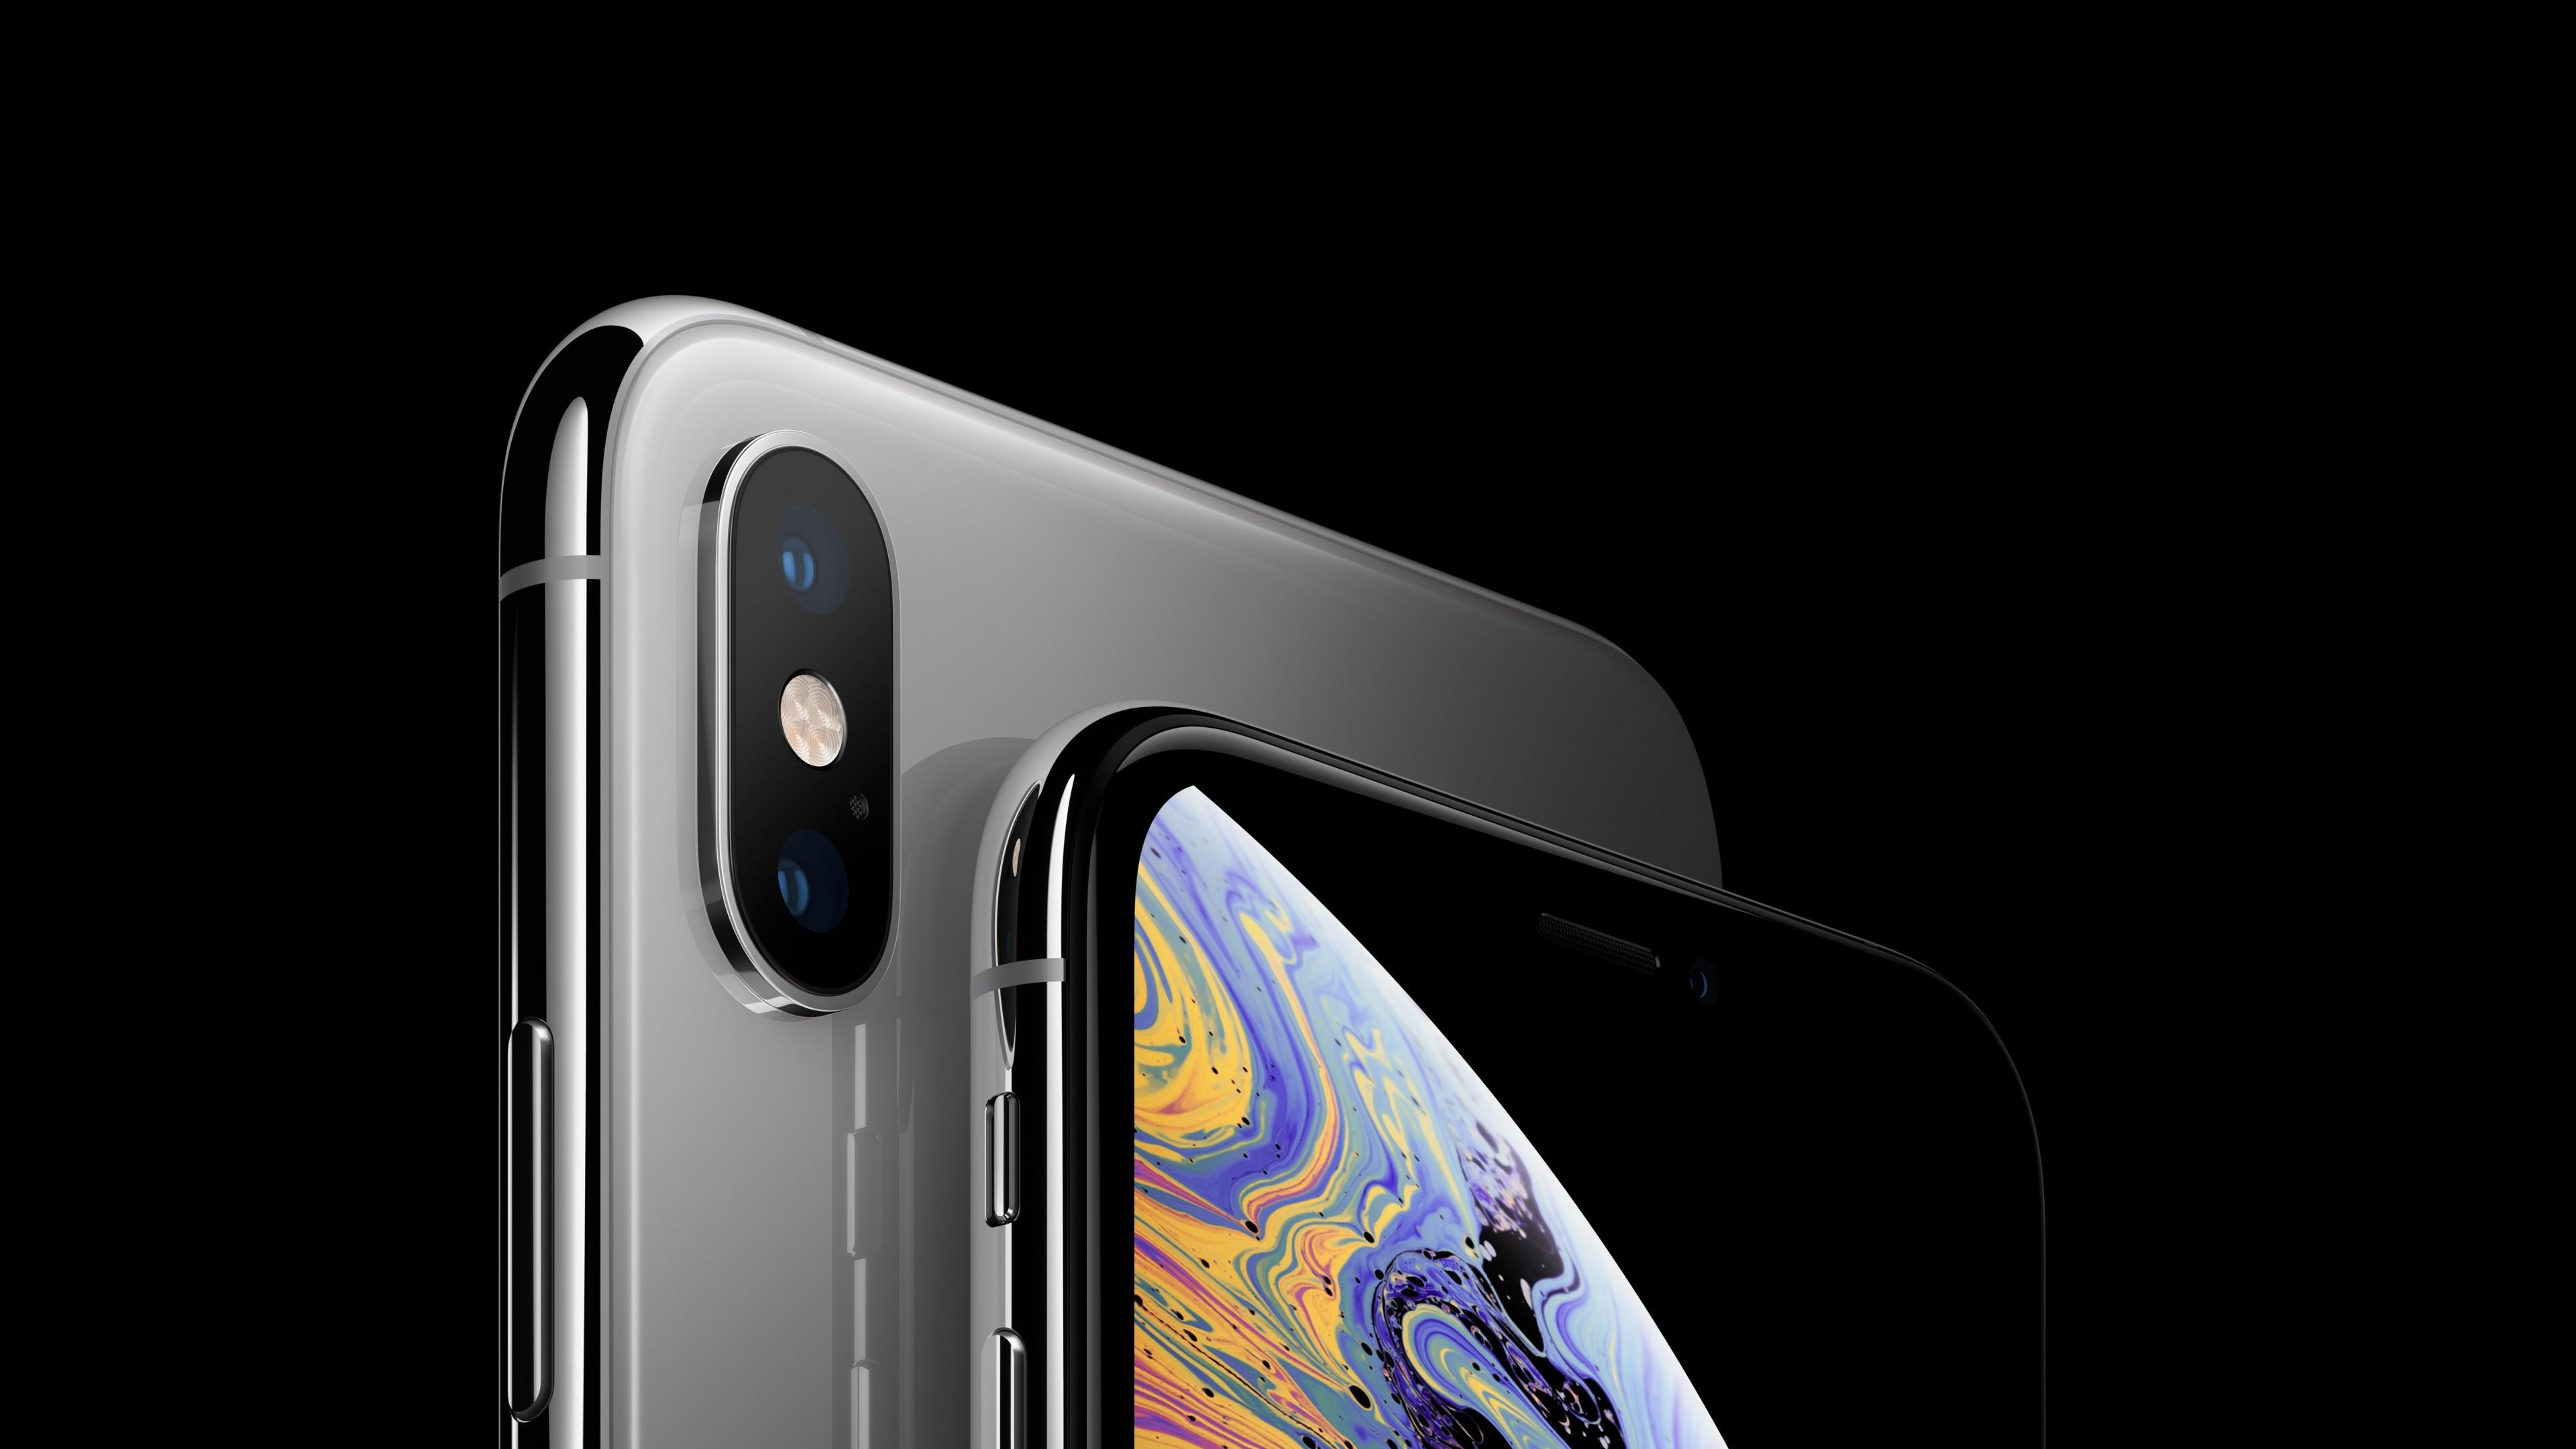 айфон xs max 64 серебристый